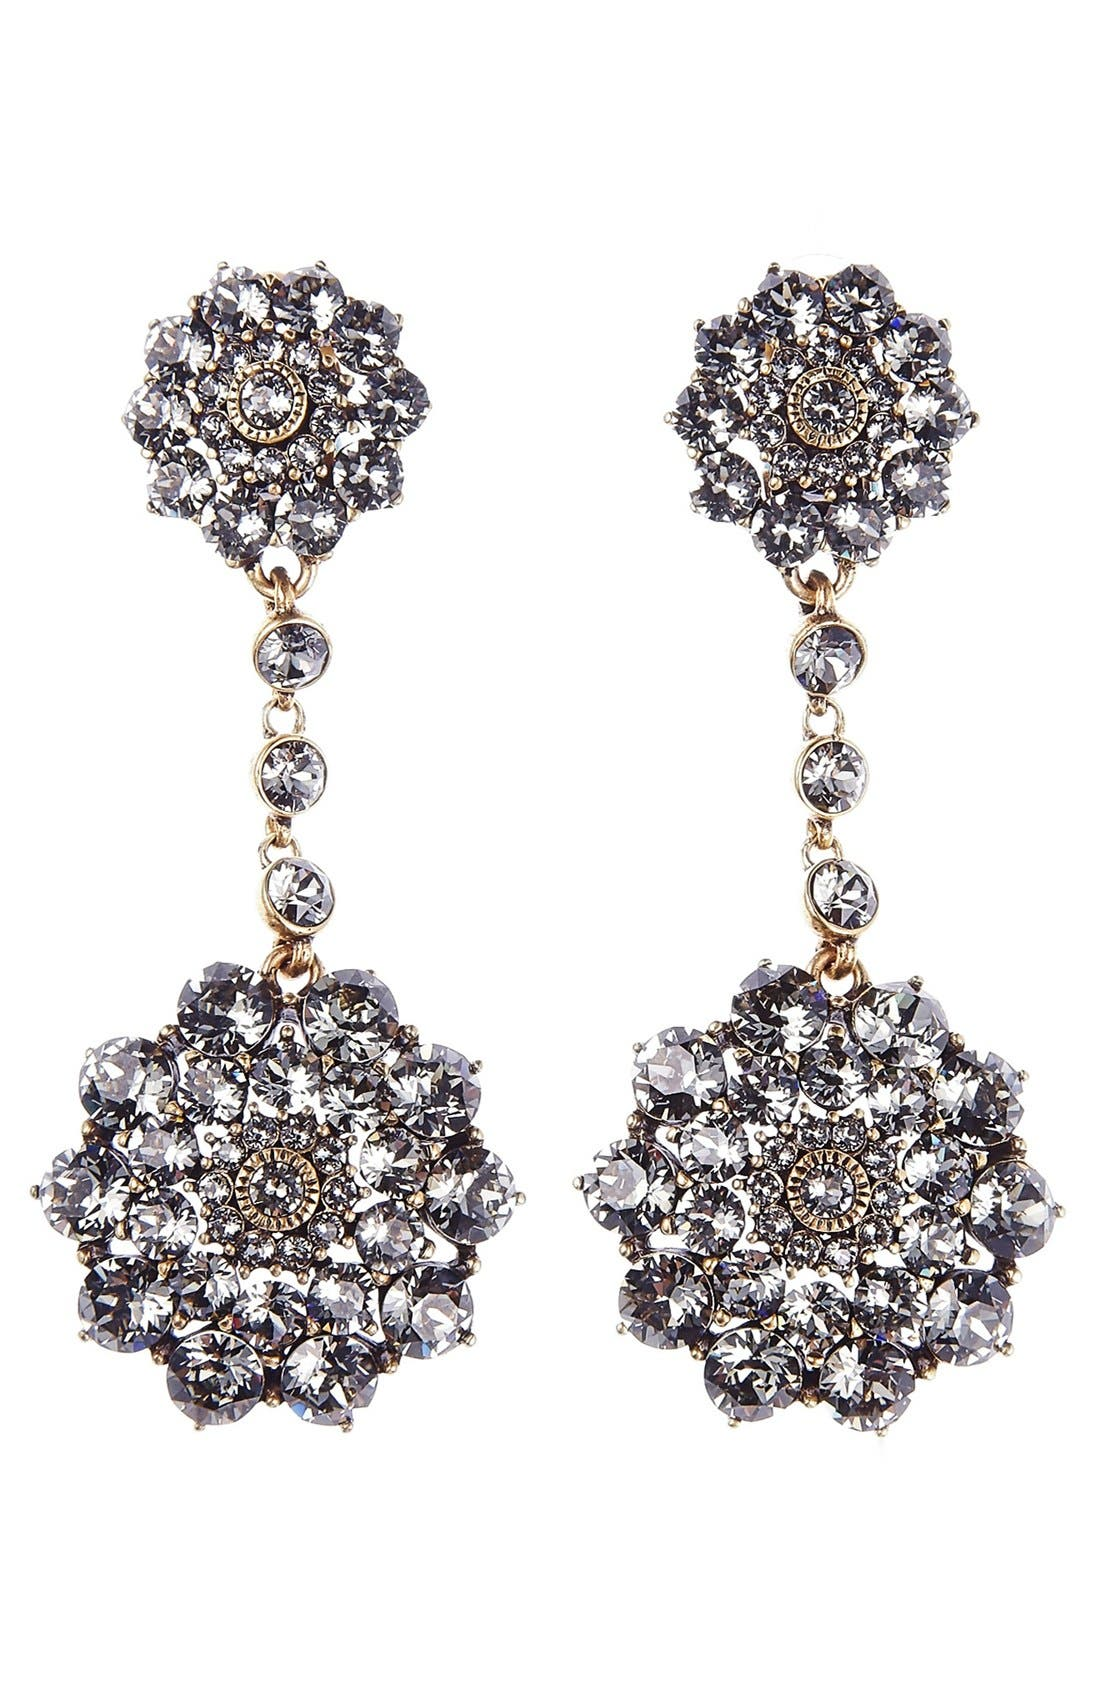 'Classic Jeweled' Swarovski Crystal Drop Earrings,                             Main thumbnail 1, color,                             BLACK